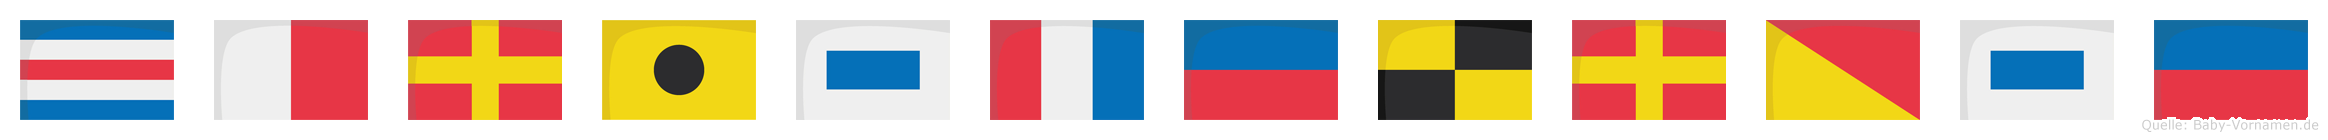 Christelrose im Flaggenalphabet